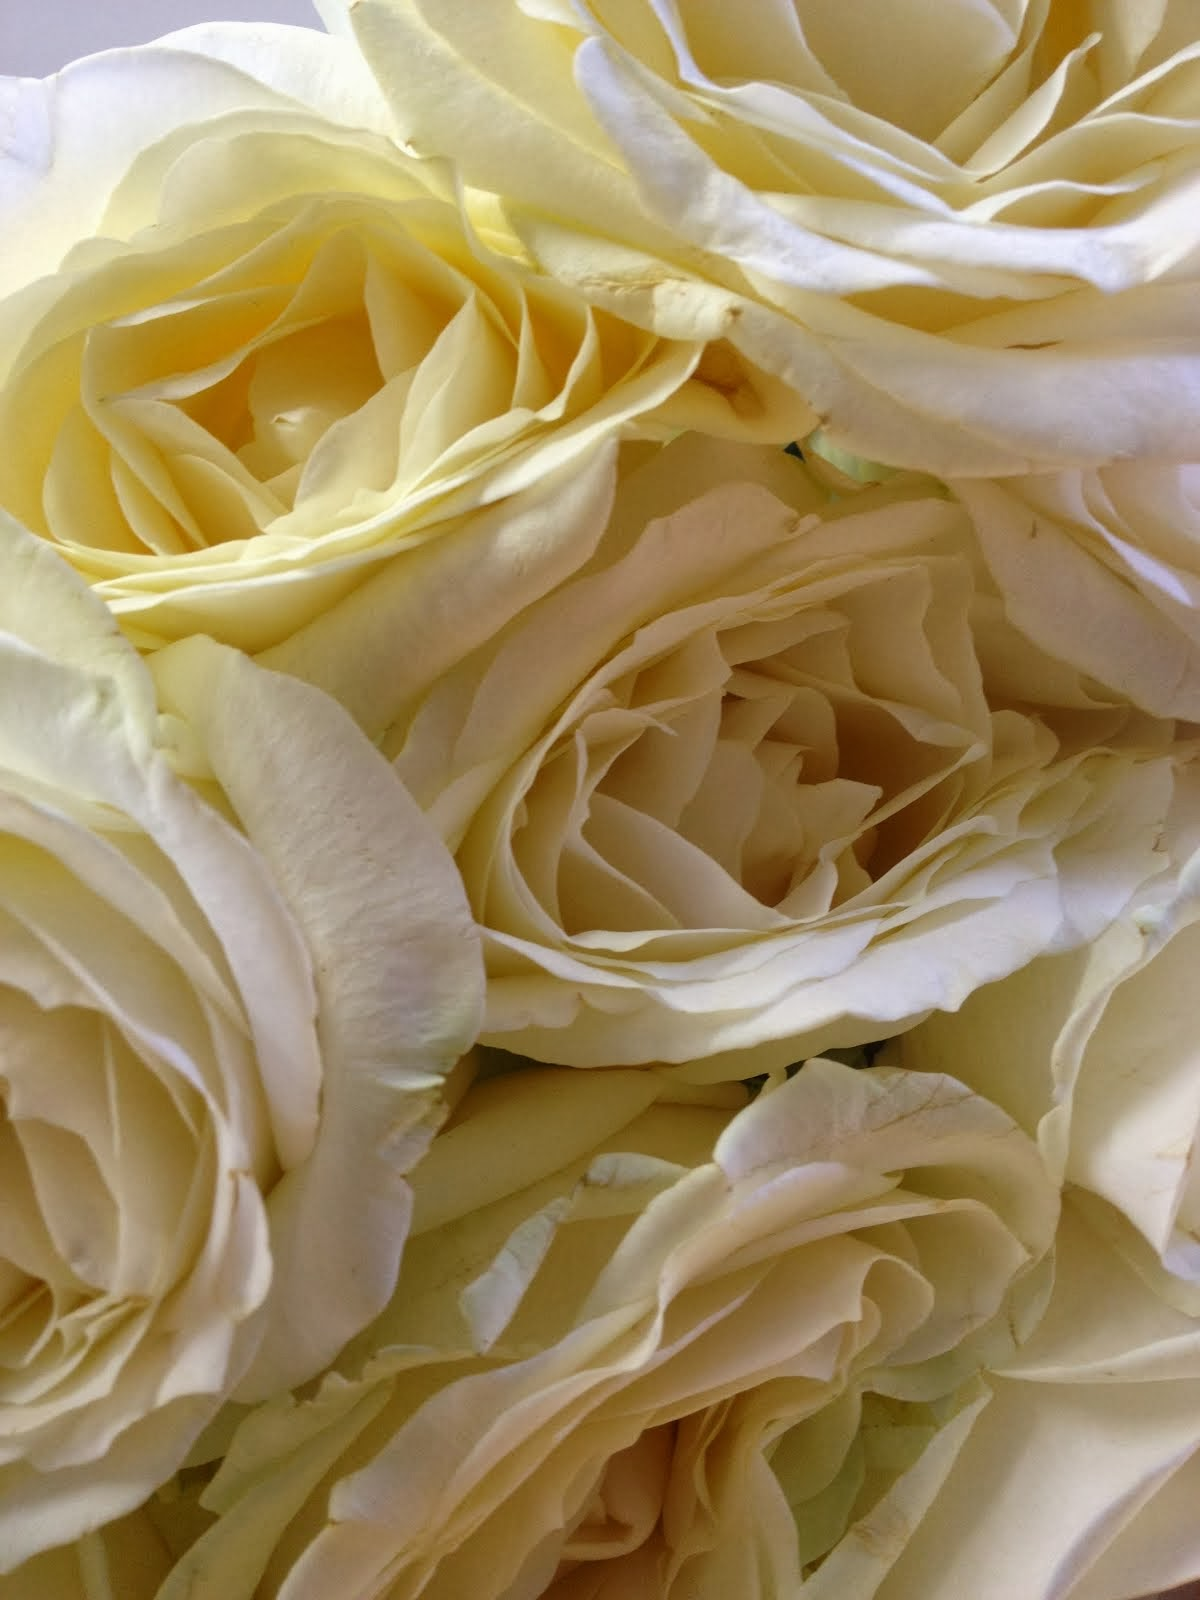 Avalance rose..